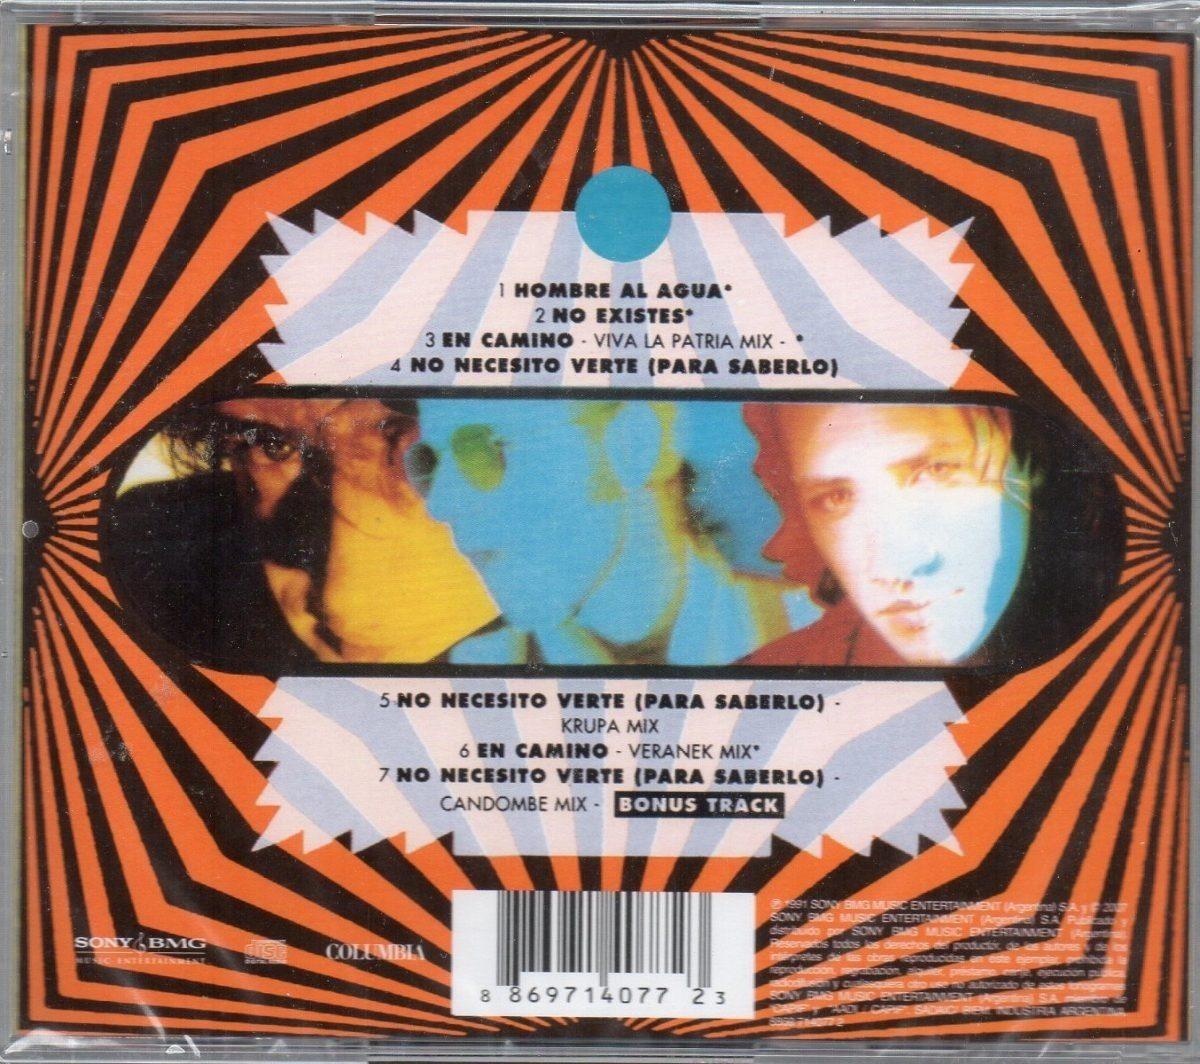 Soda Stereo - Rex Mix CD